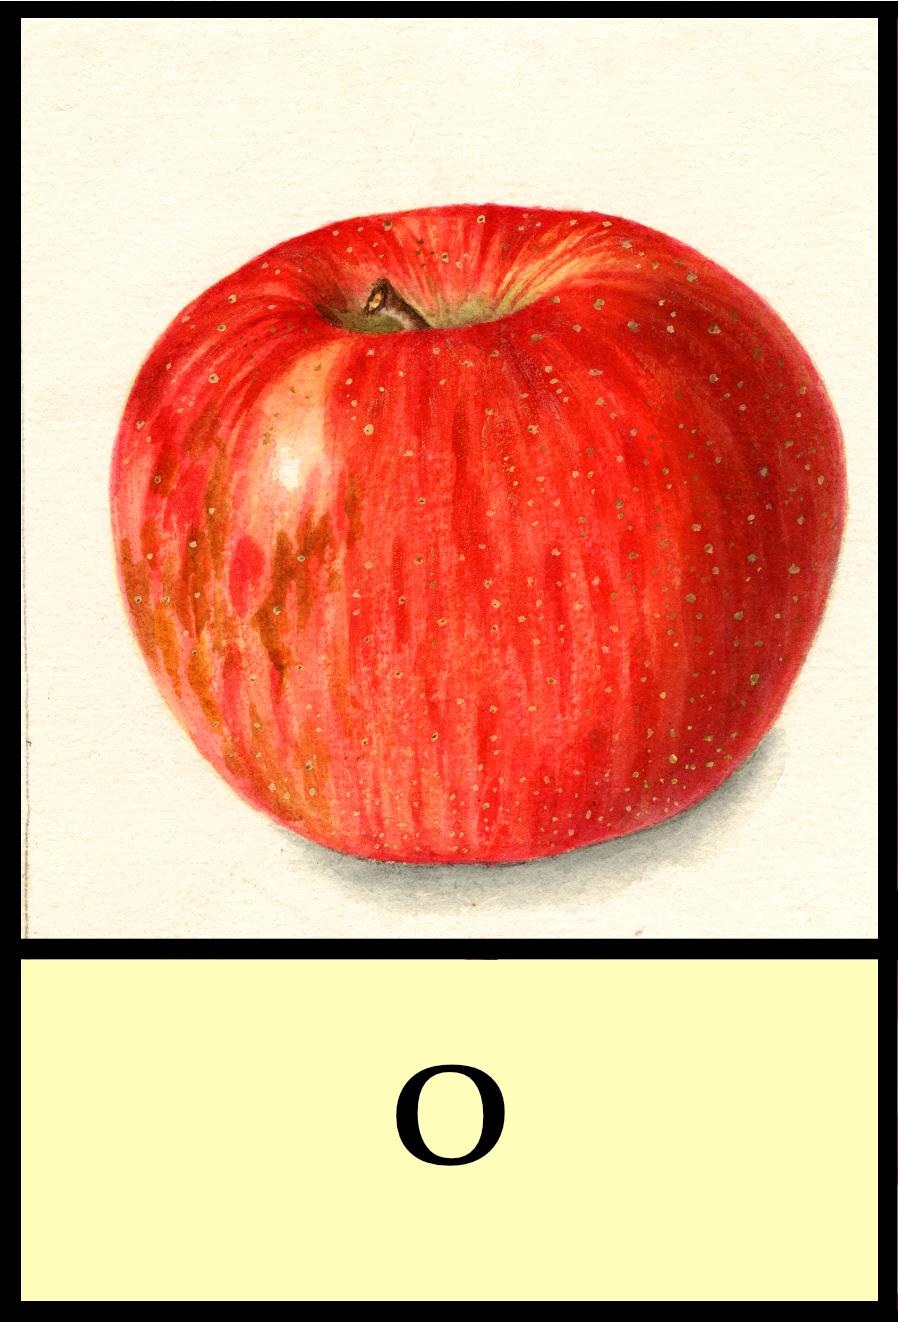 O apples